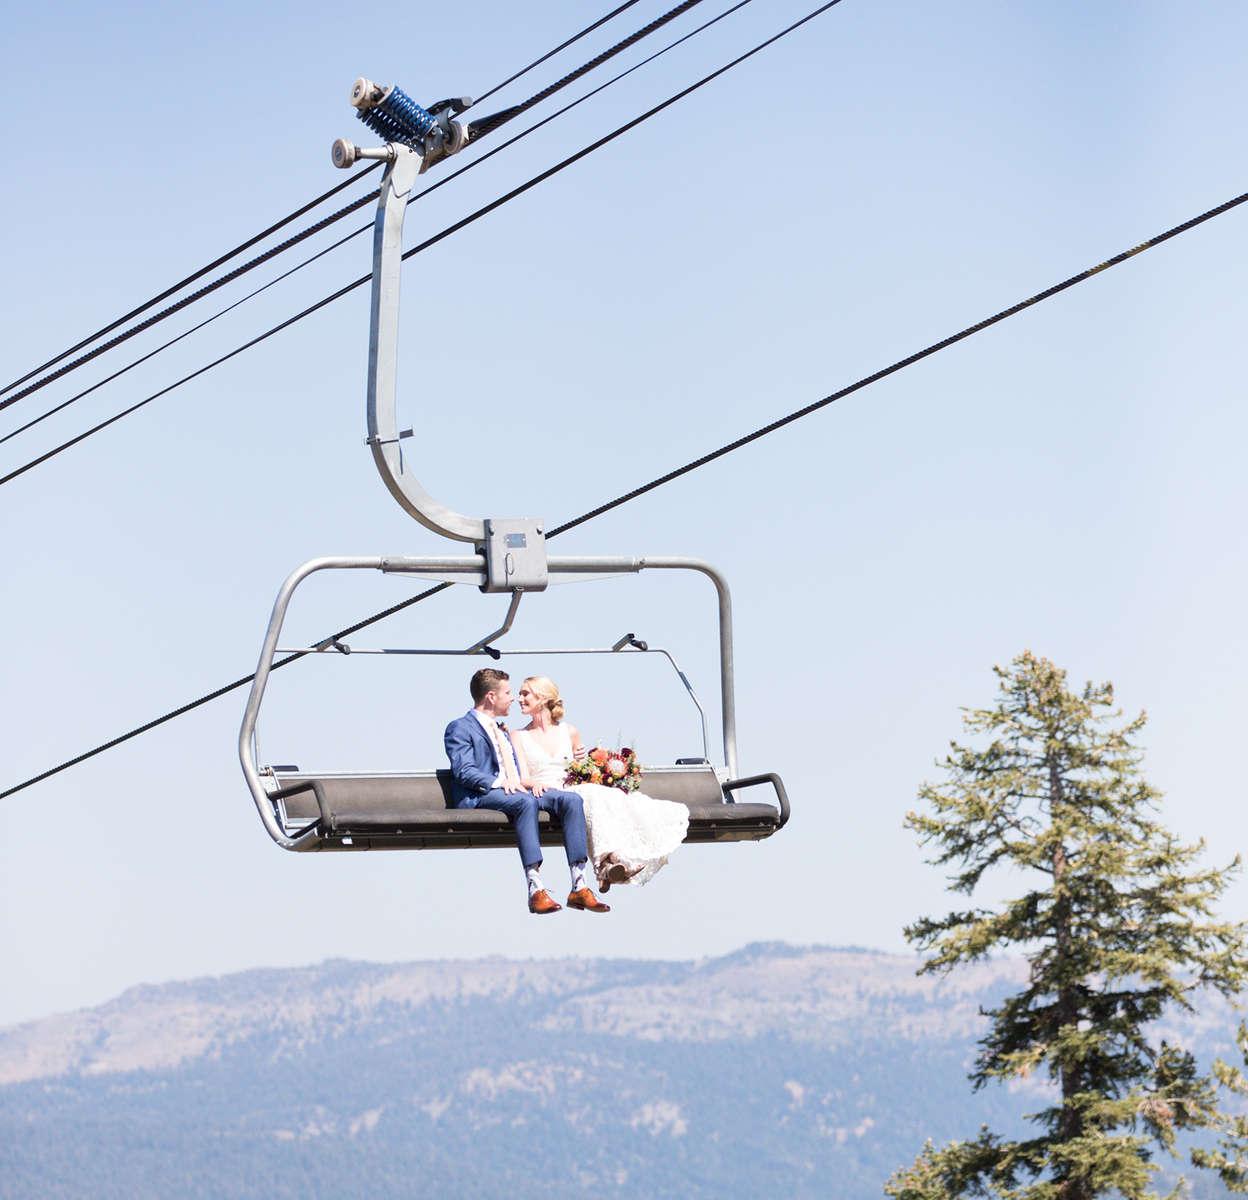 ski-lift-bride-and-groom-Northstar